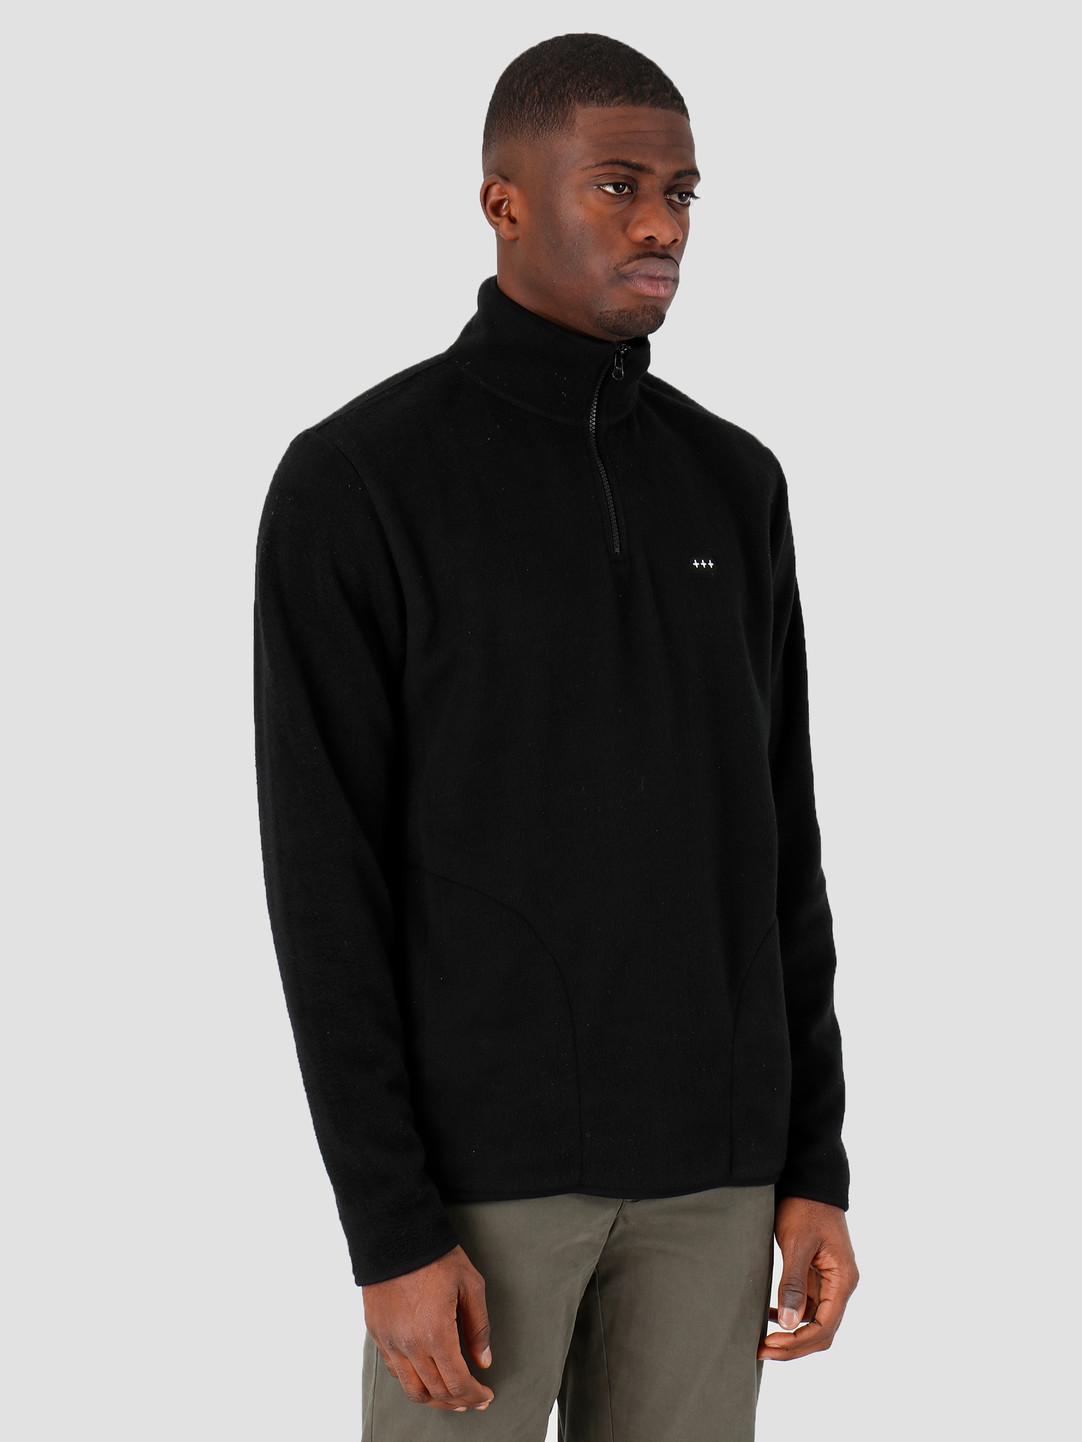 Quality Blanks Quality Blanks QB95 Half Zip Fleece Black